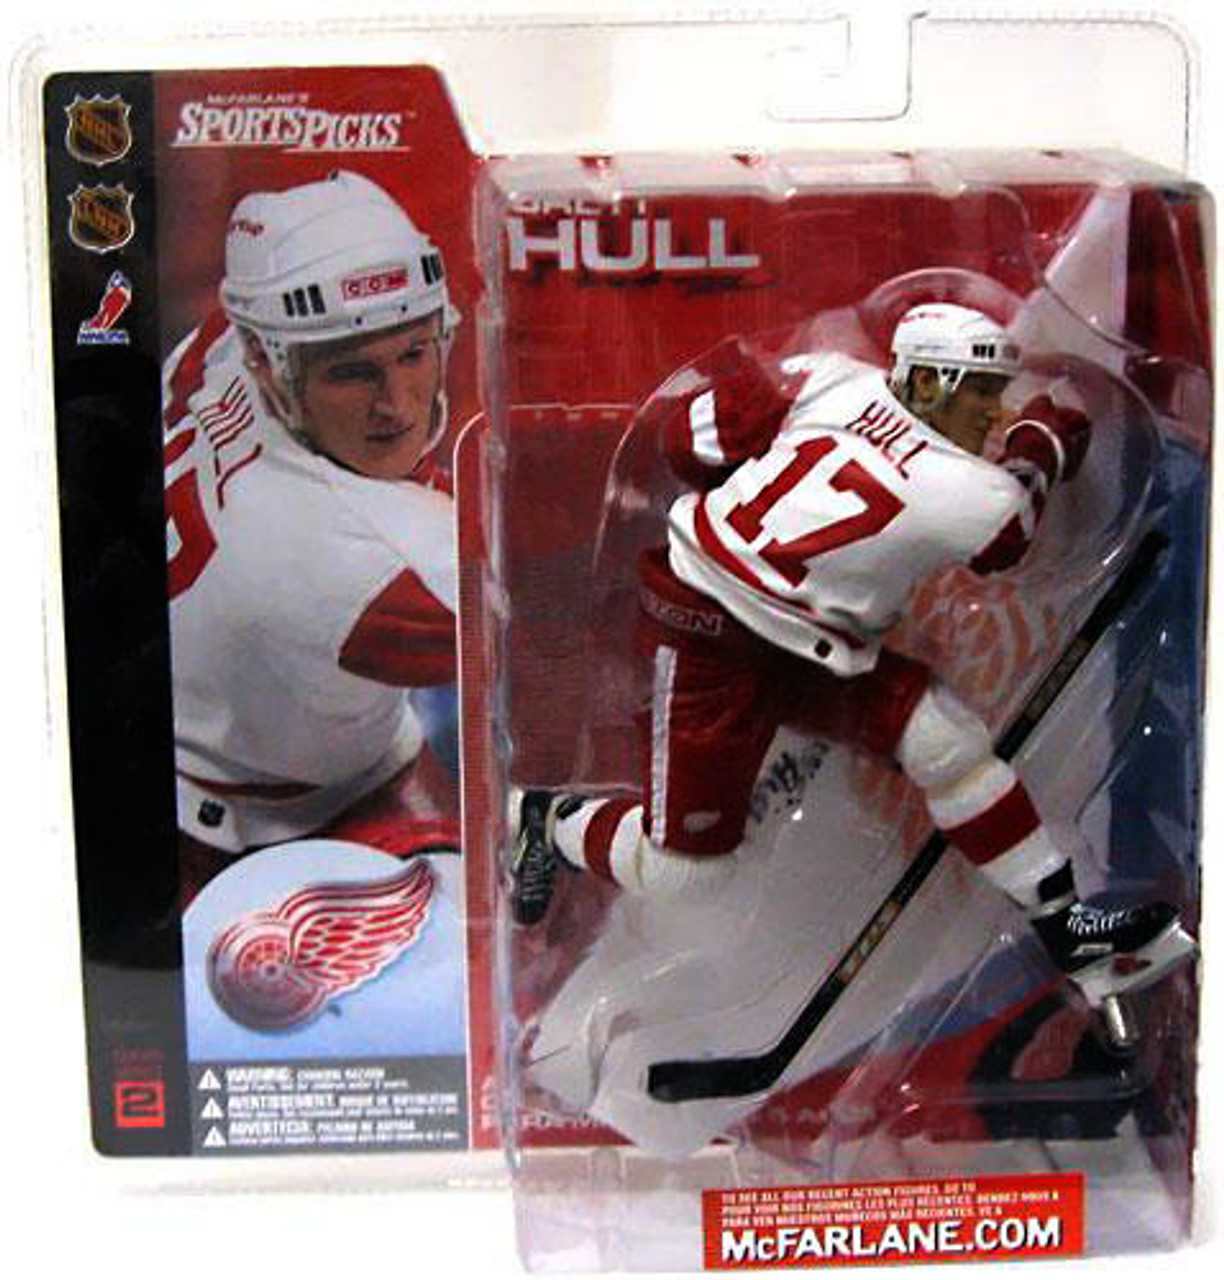 McFarlane Toys NHL Detroit Red Wings Sports Picks Series 2 Brett Hull Action Figure